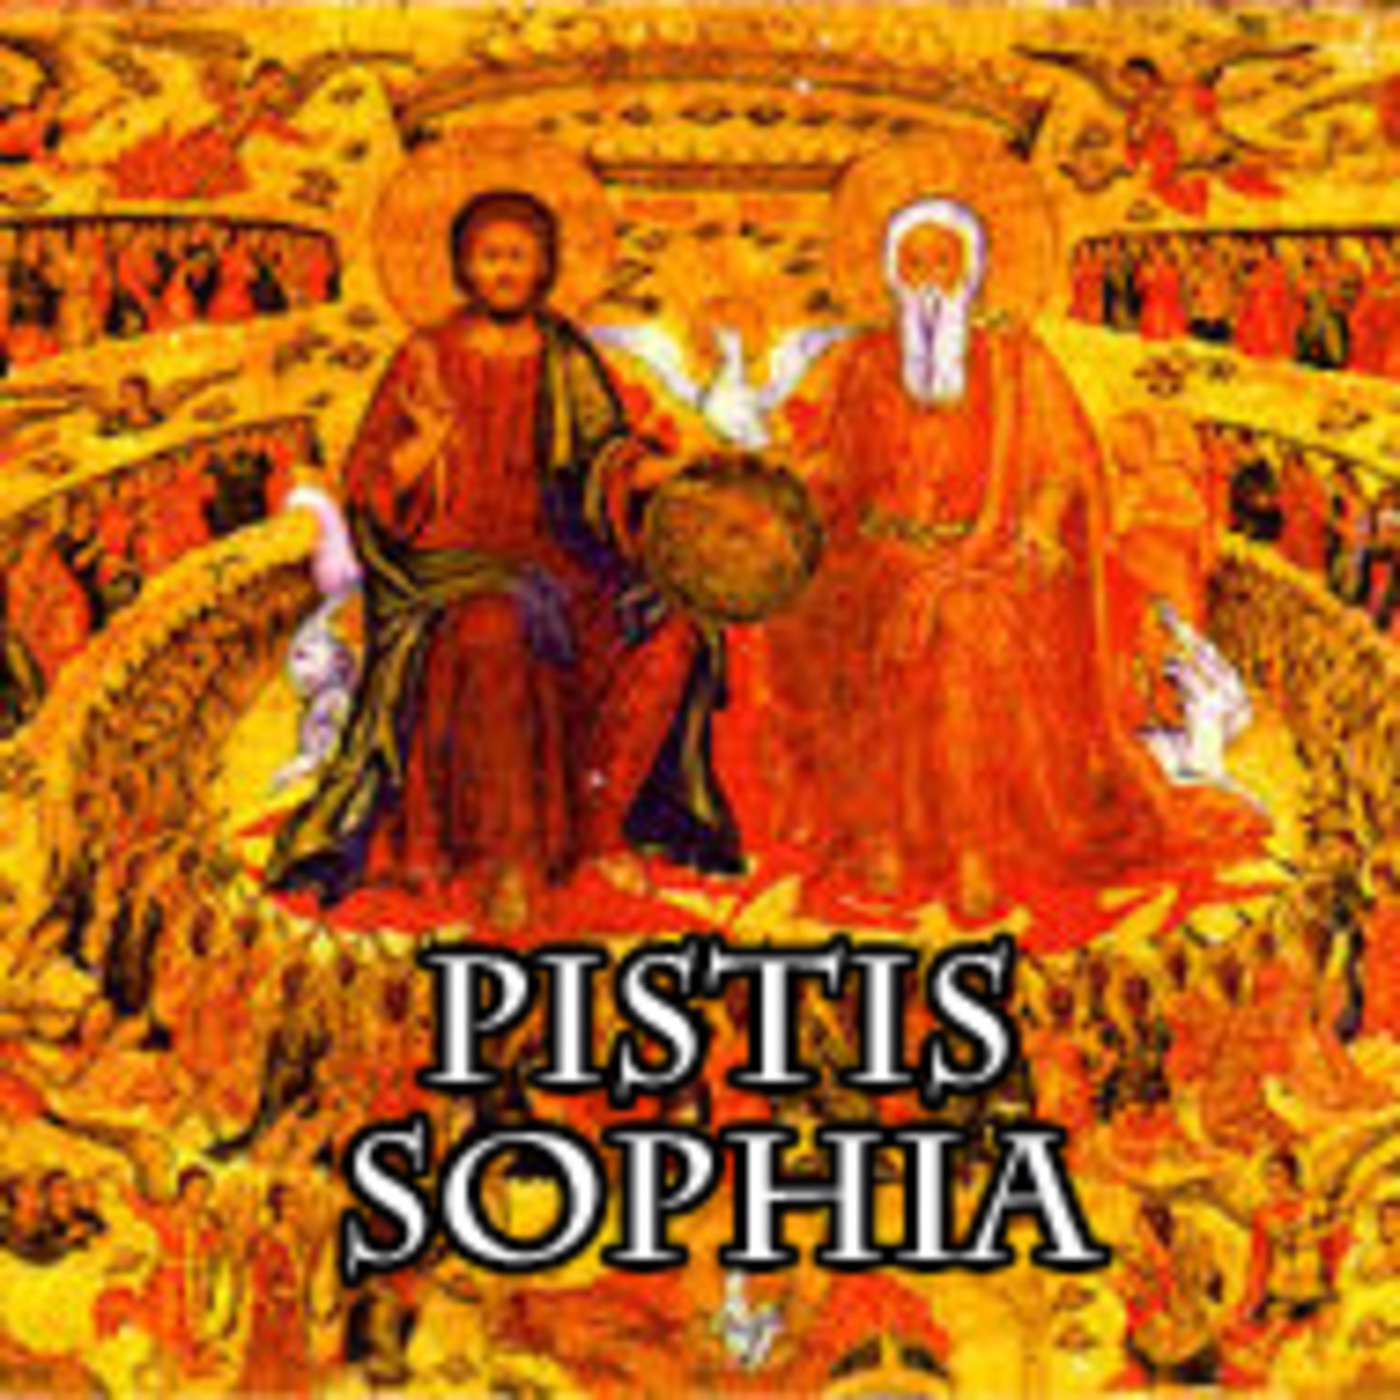 Hitos: Pistis Sophia